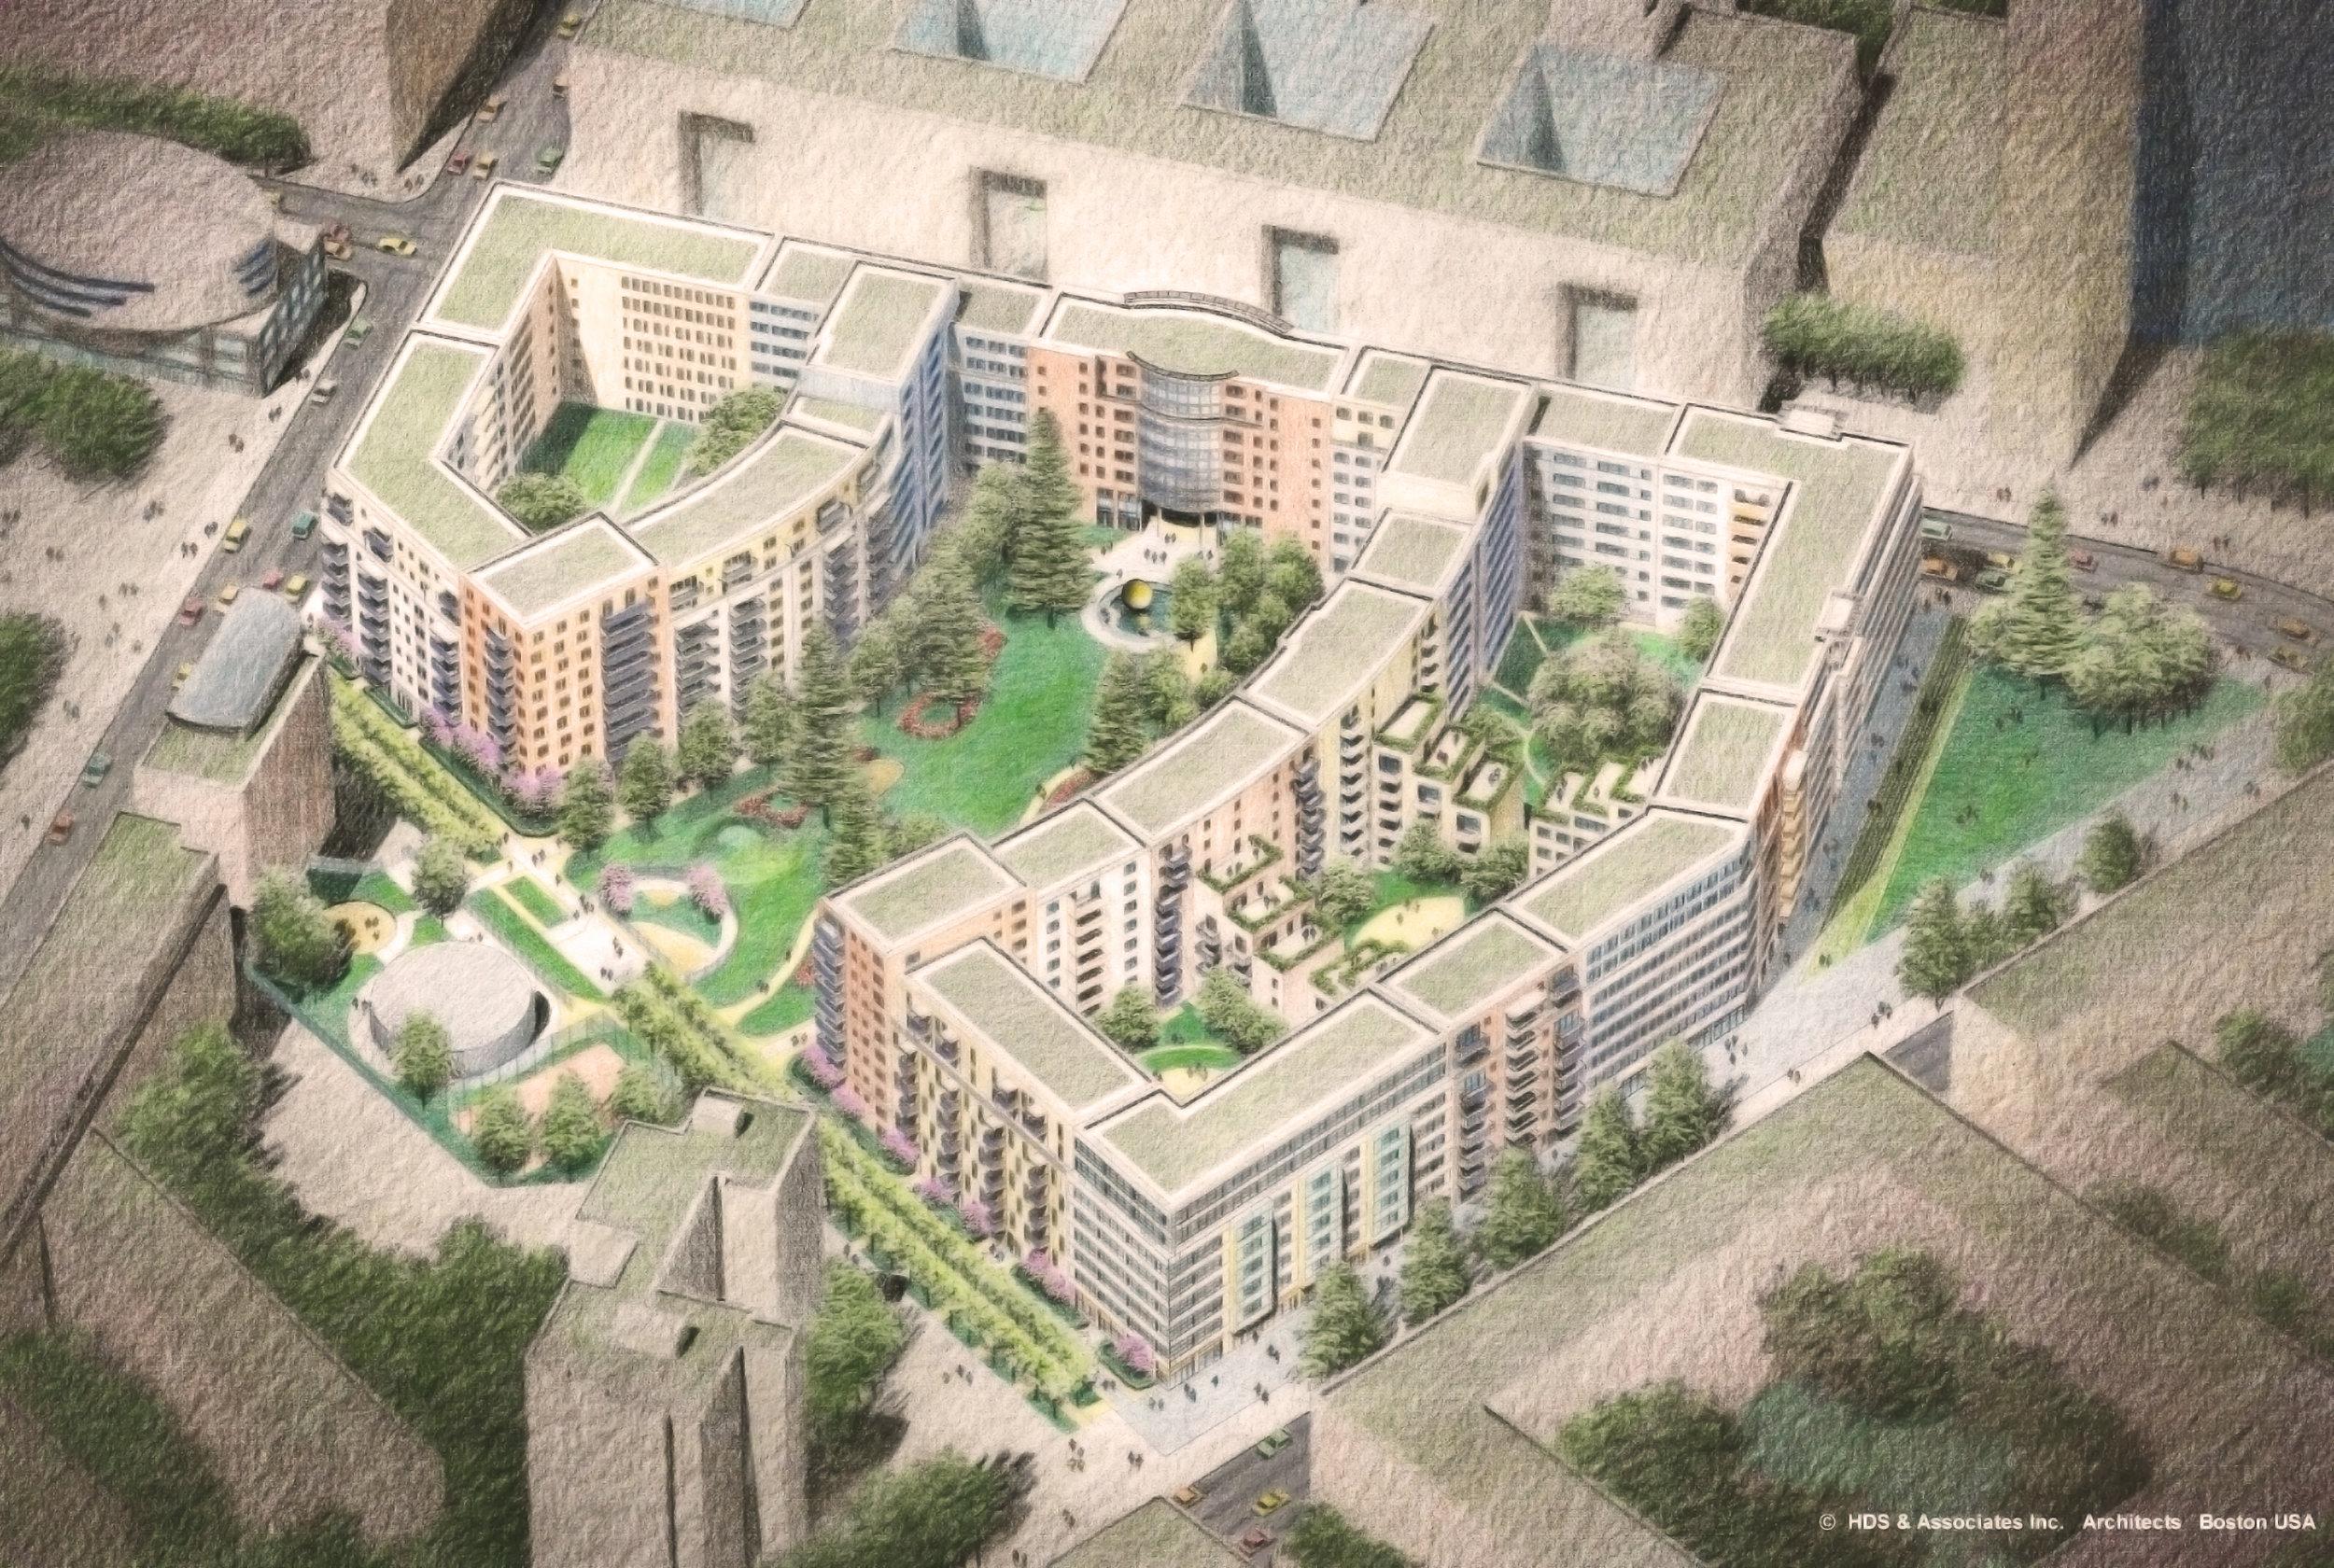 Markengrafenpark Site Plan by HDS Architecture